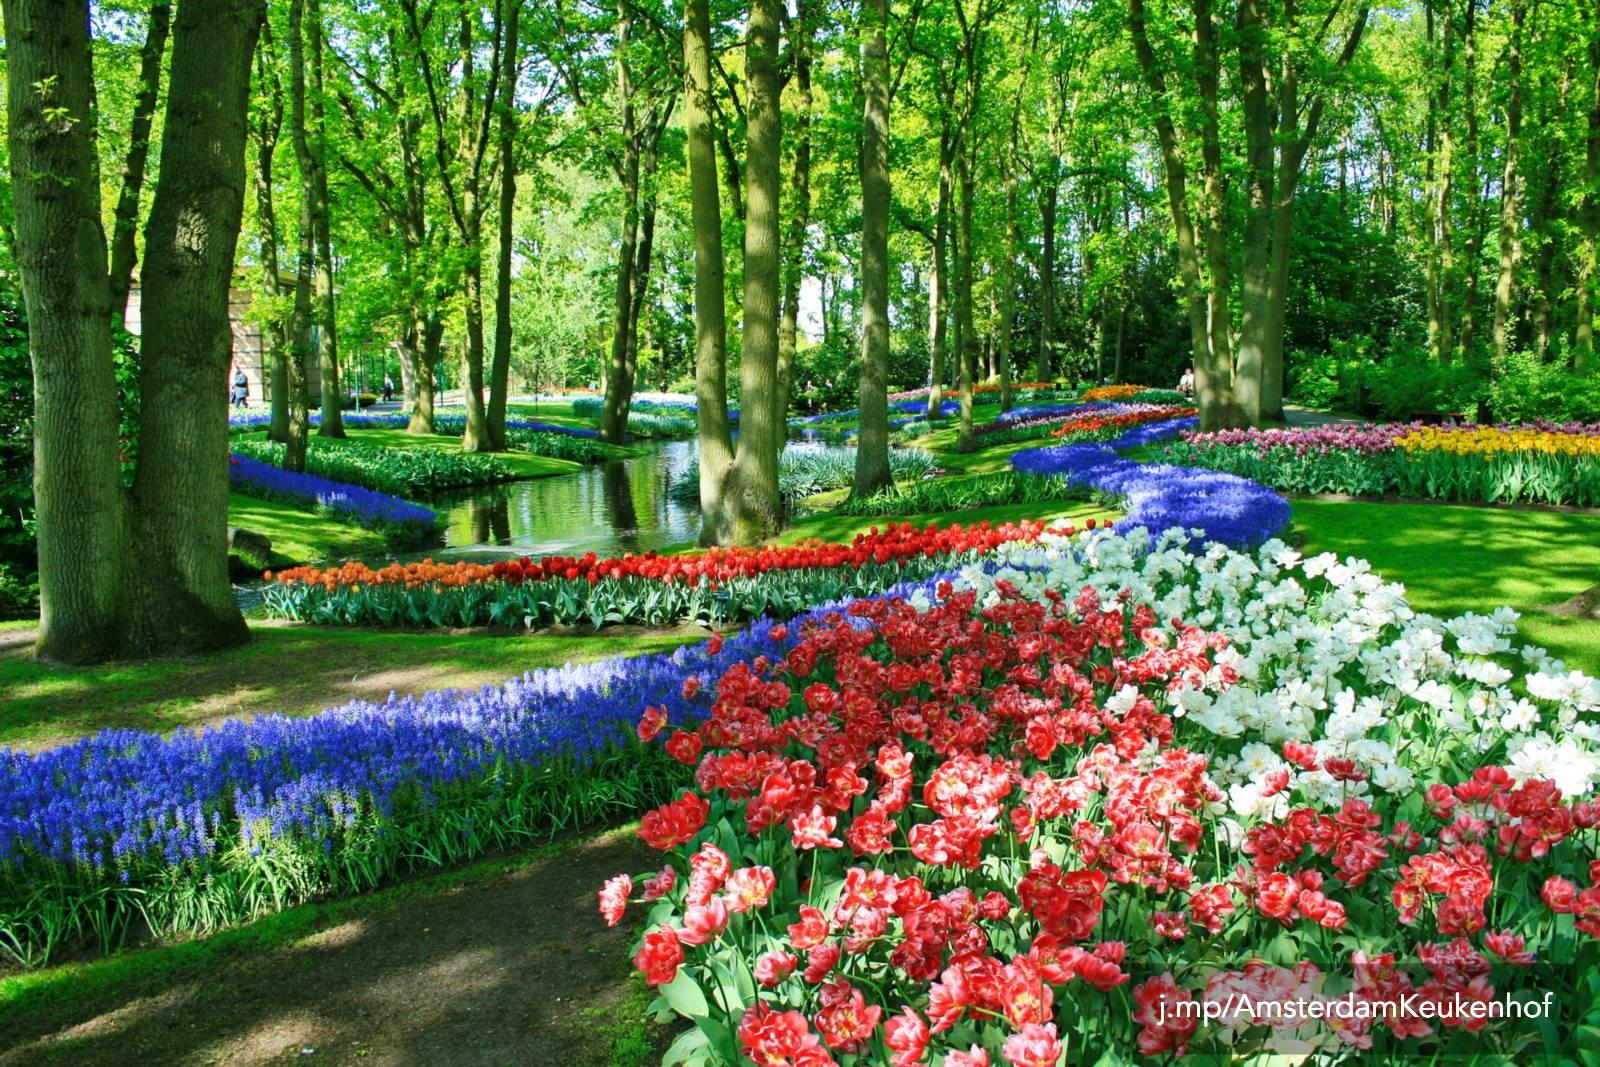 Keukenhof flower garden